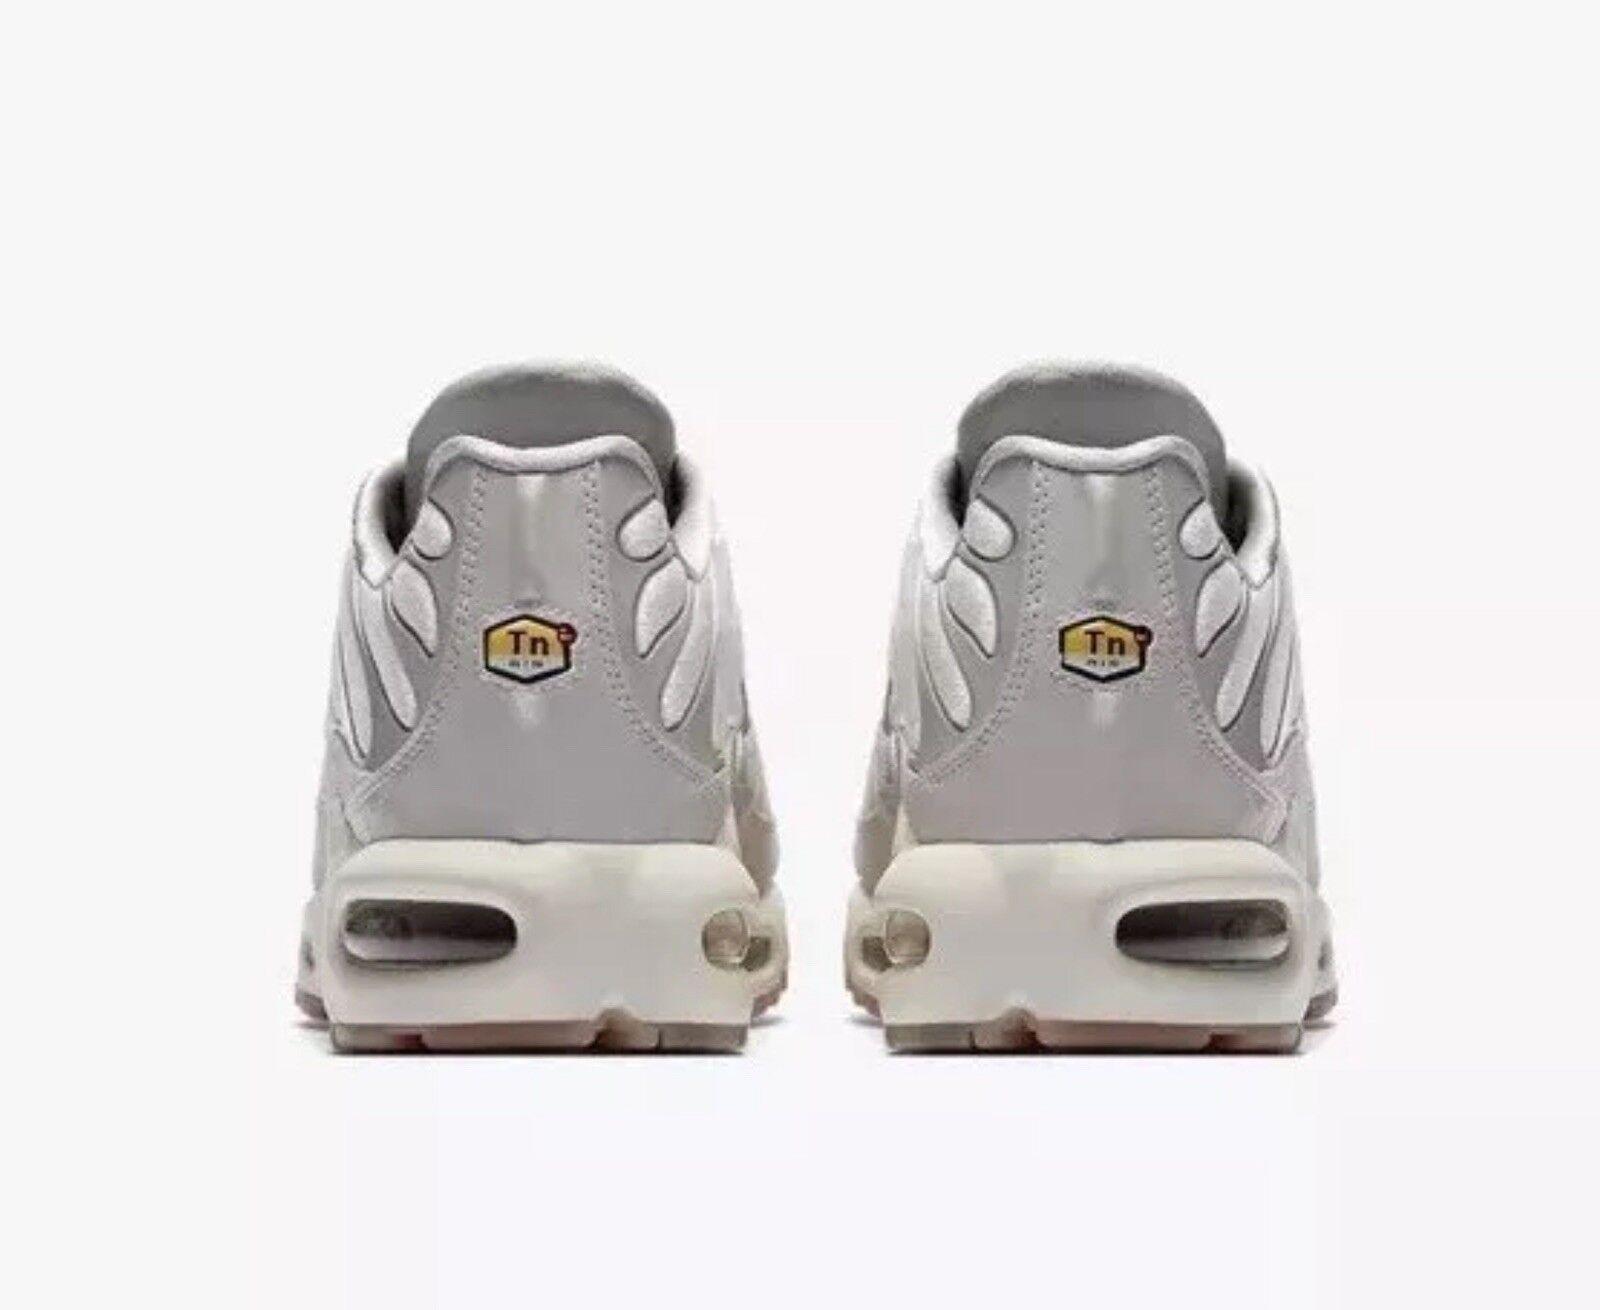 Wmns Nike Nike Nike Air Max Plus LX-AH6788 600 a06b42